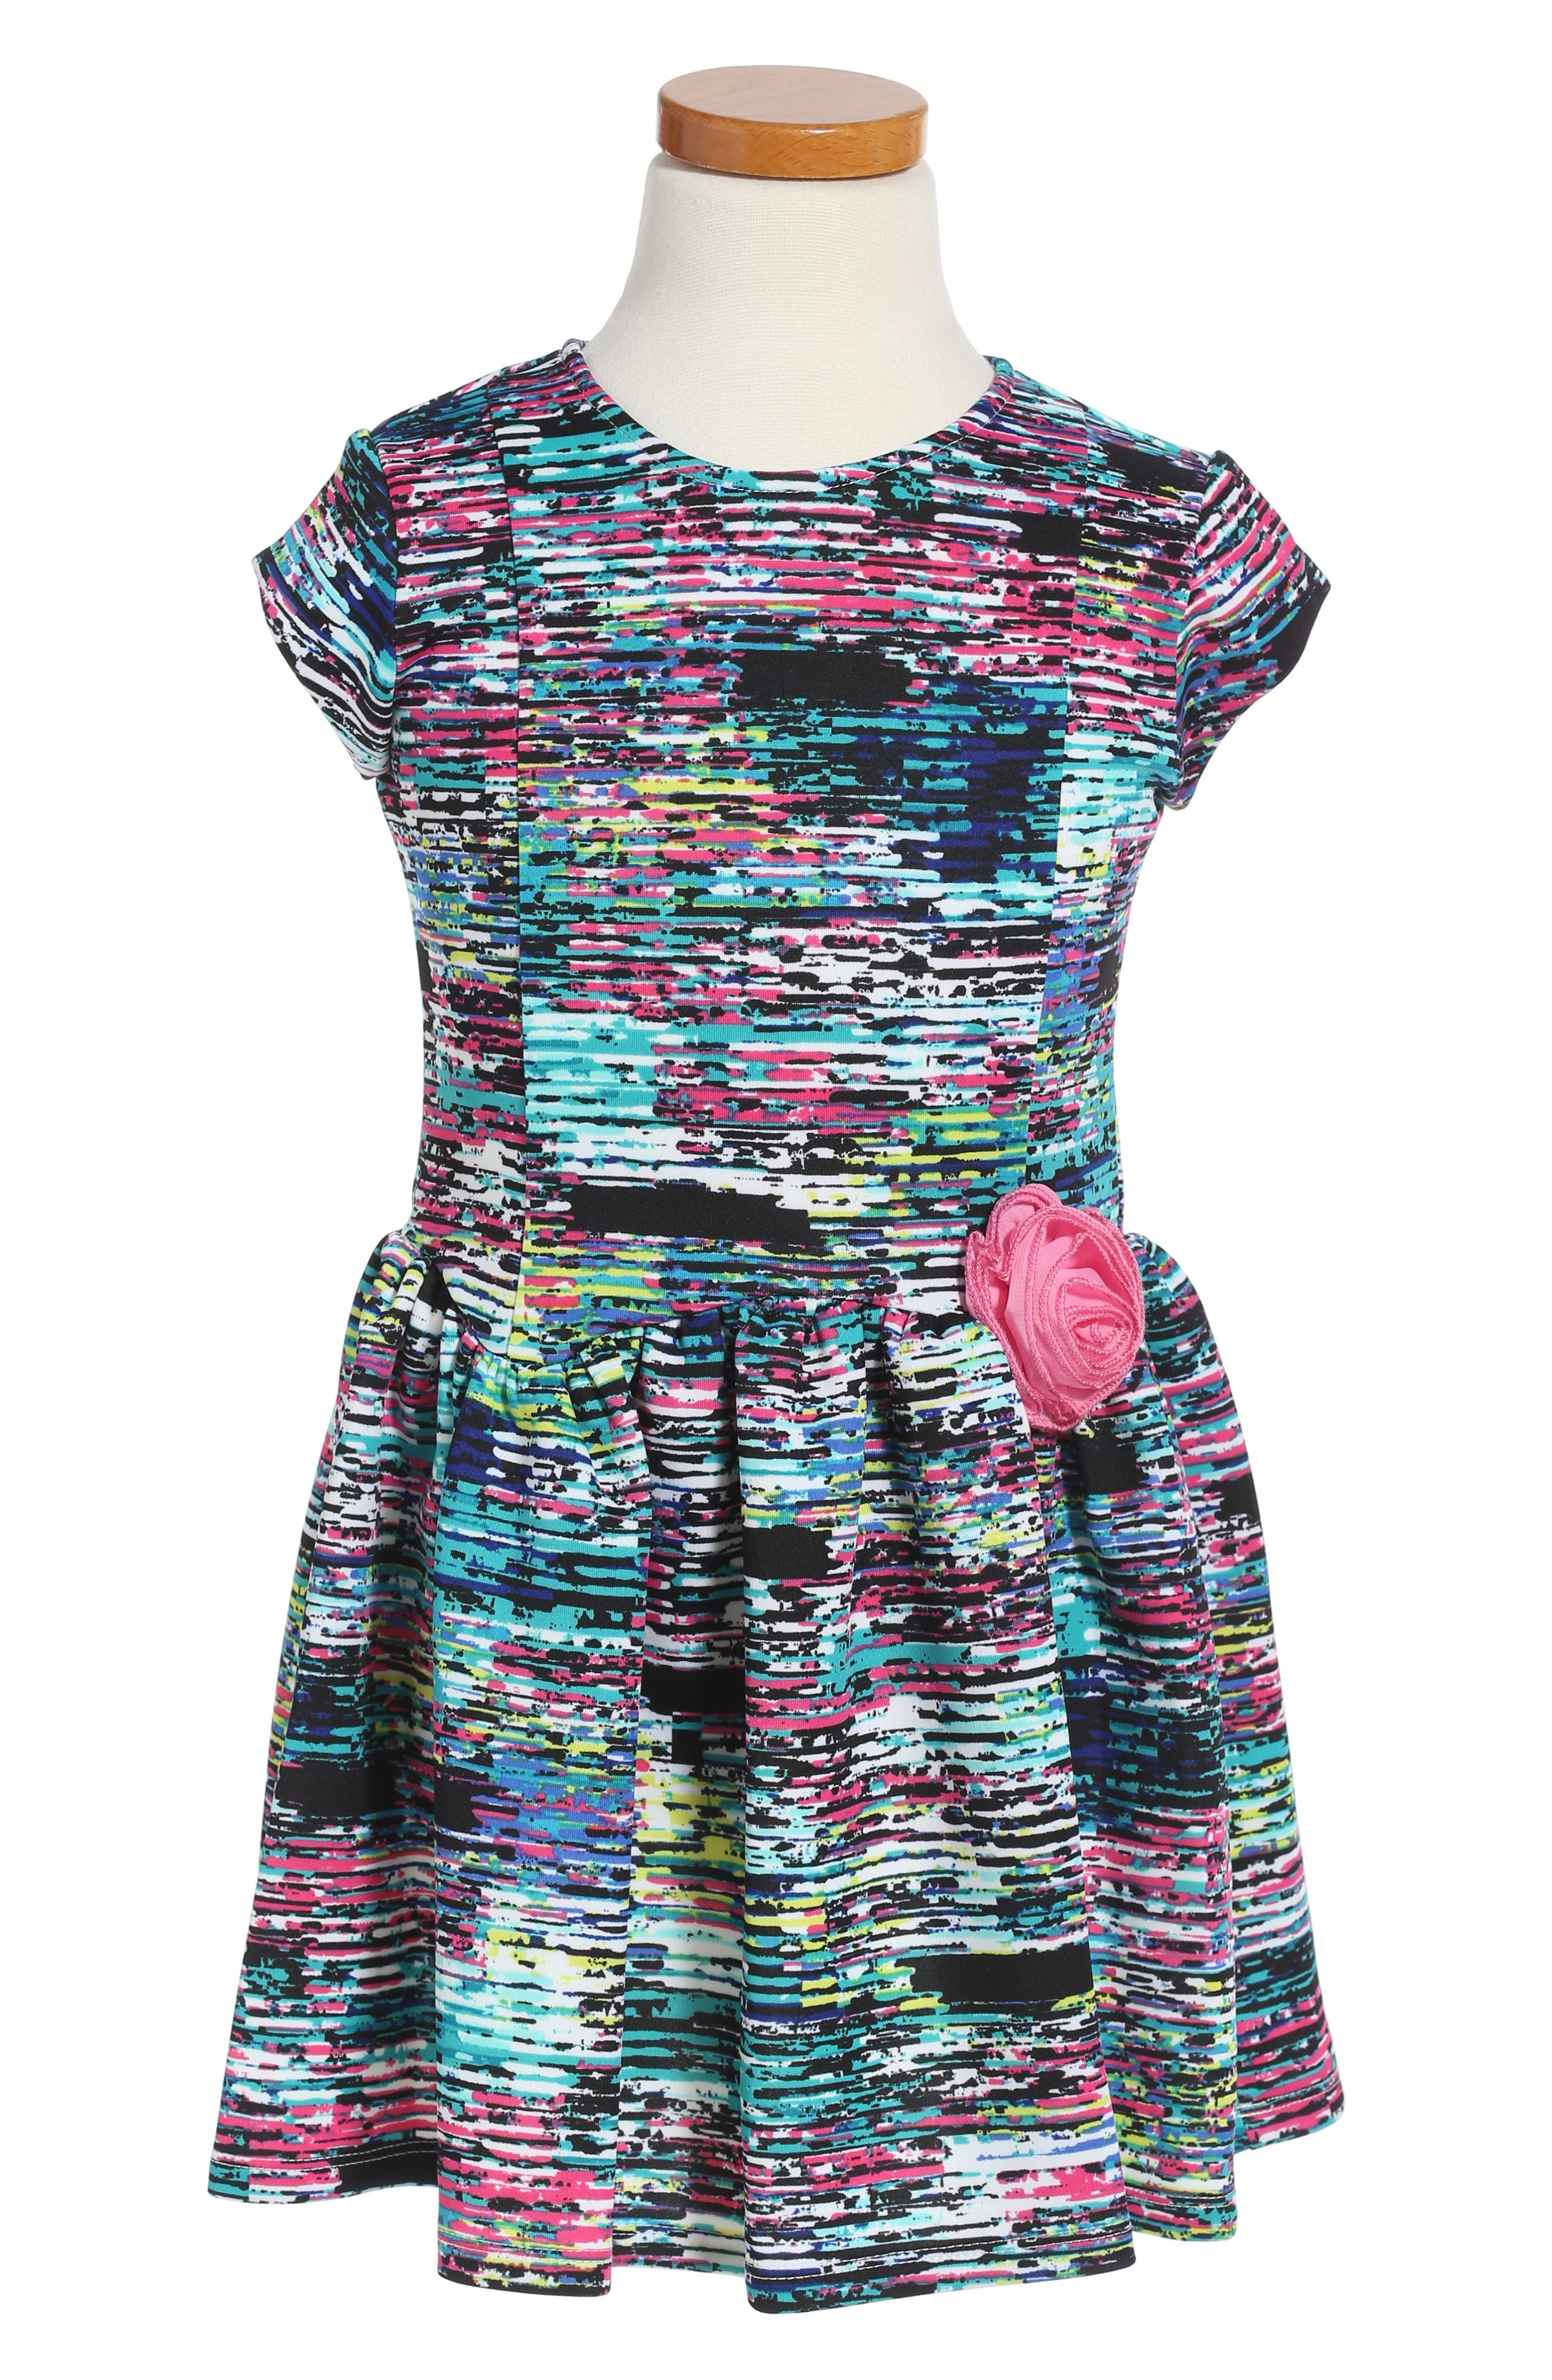 Alternate Image 1 Selected - Pippa & Julie Print Scuba Dress (Toddler Girls & Little Girls)